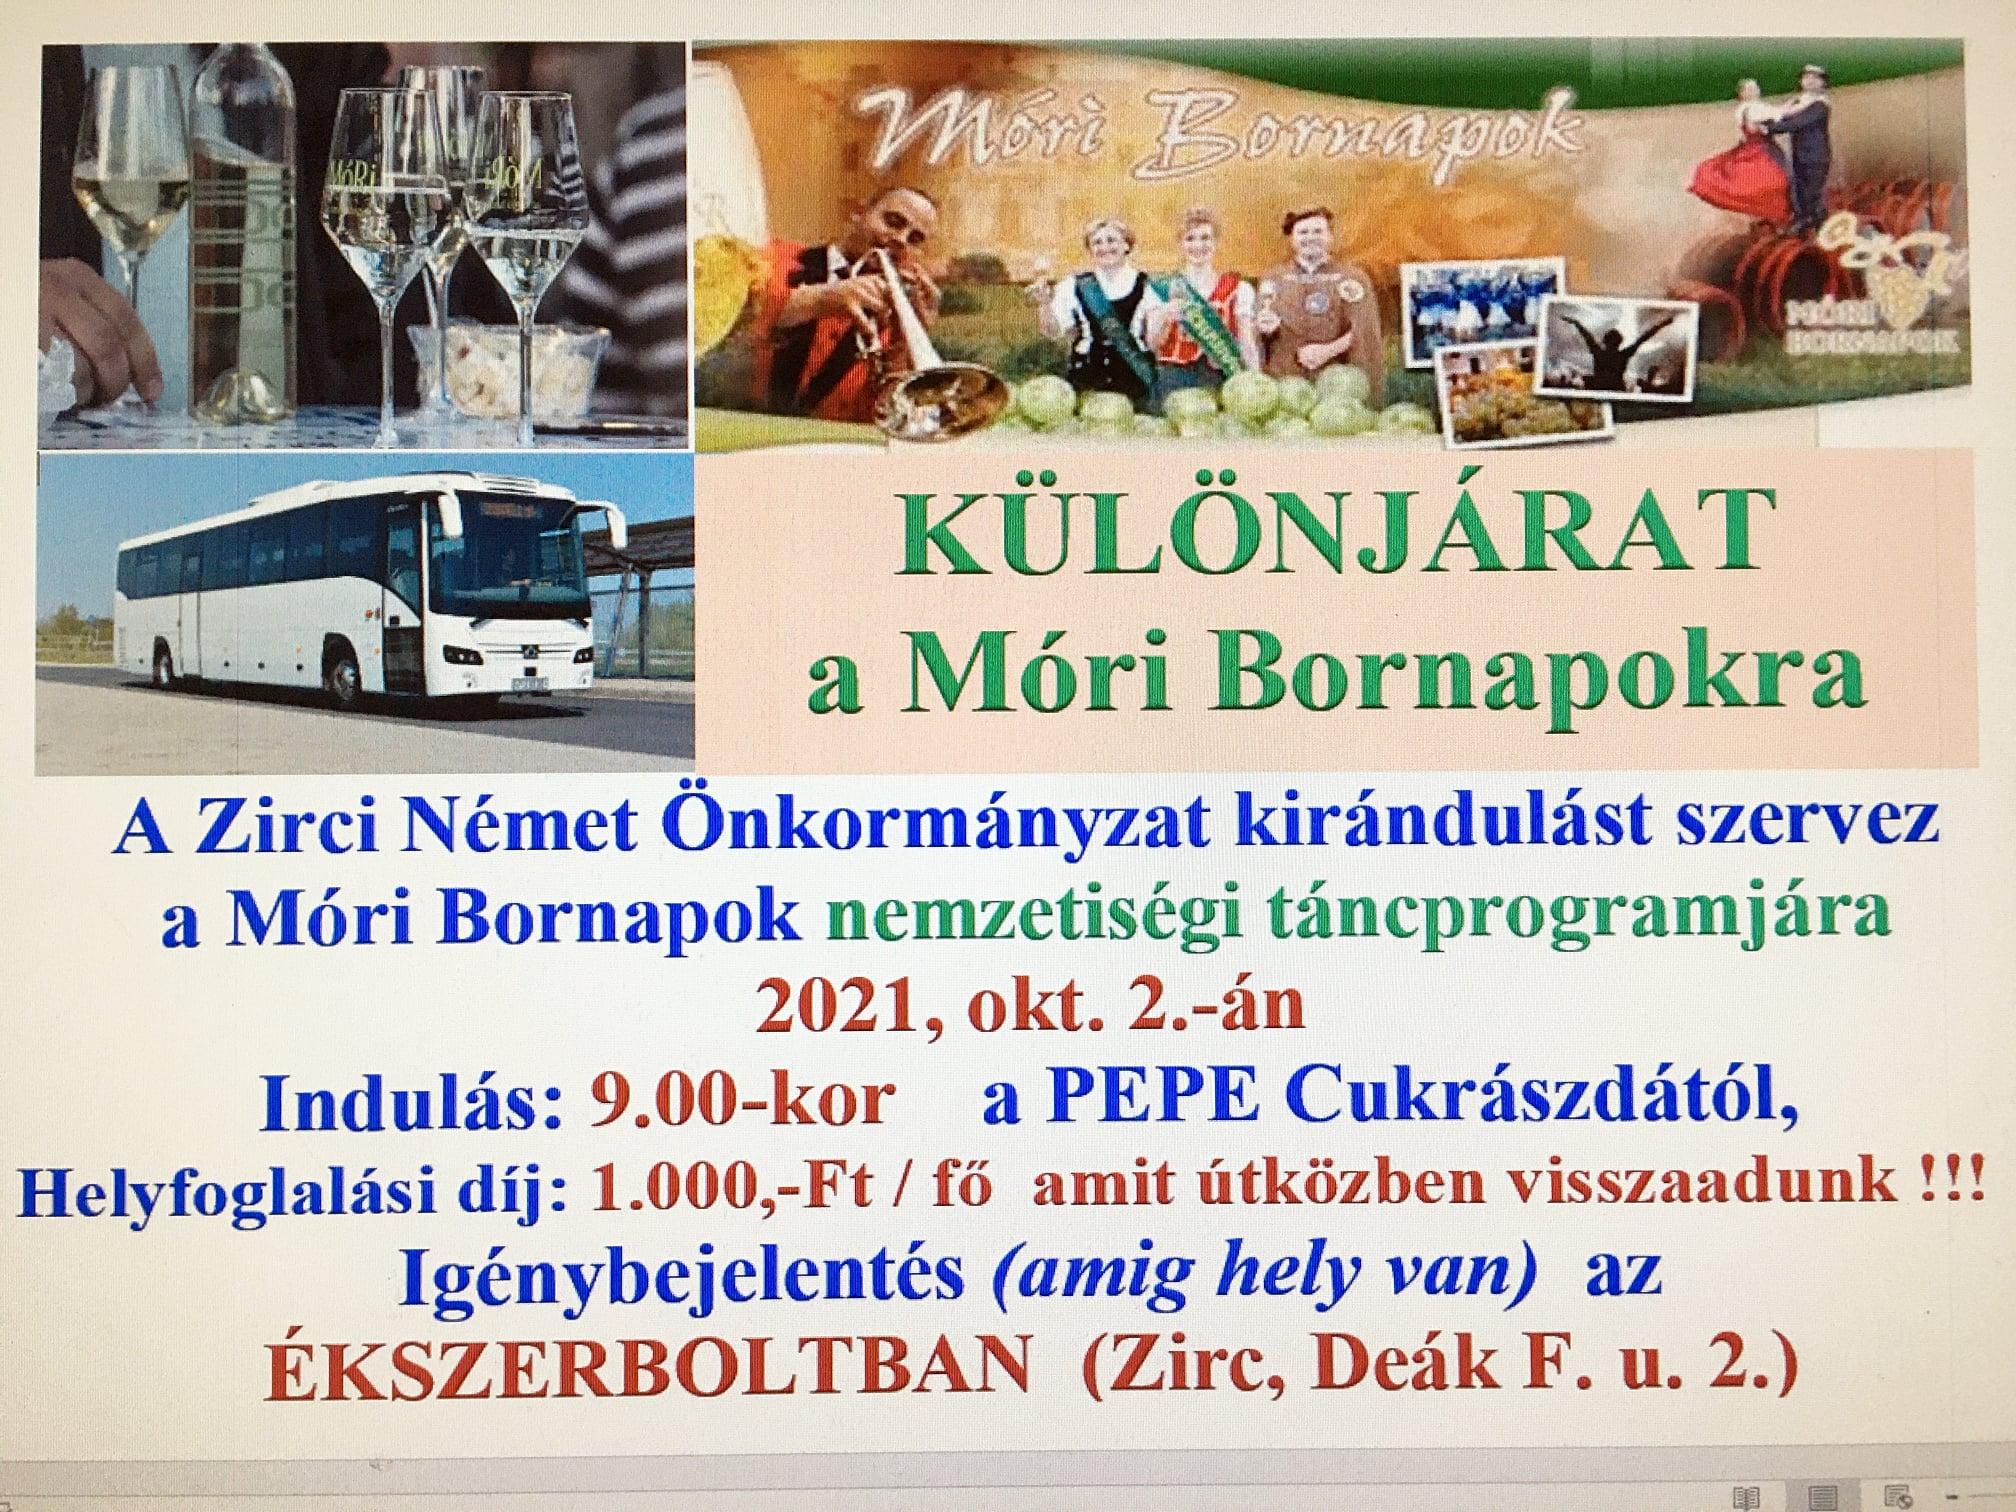 boranpok_mor2021.jpg